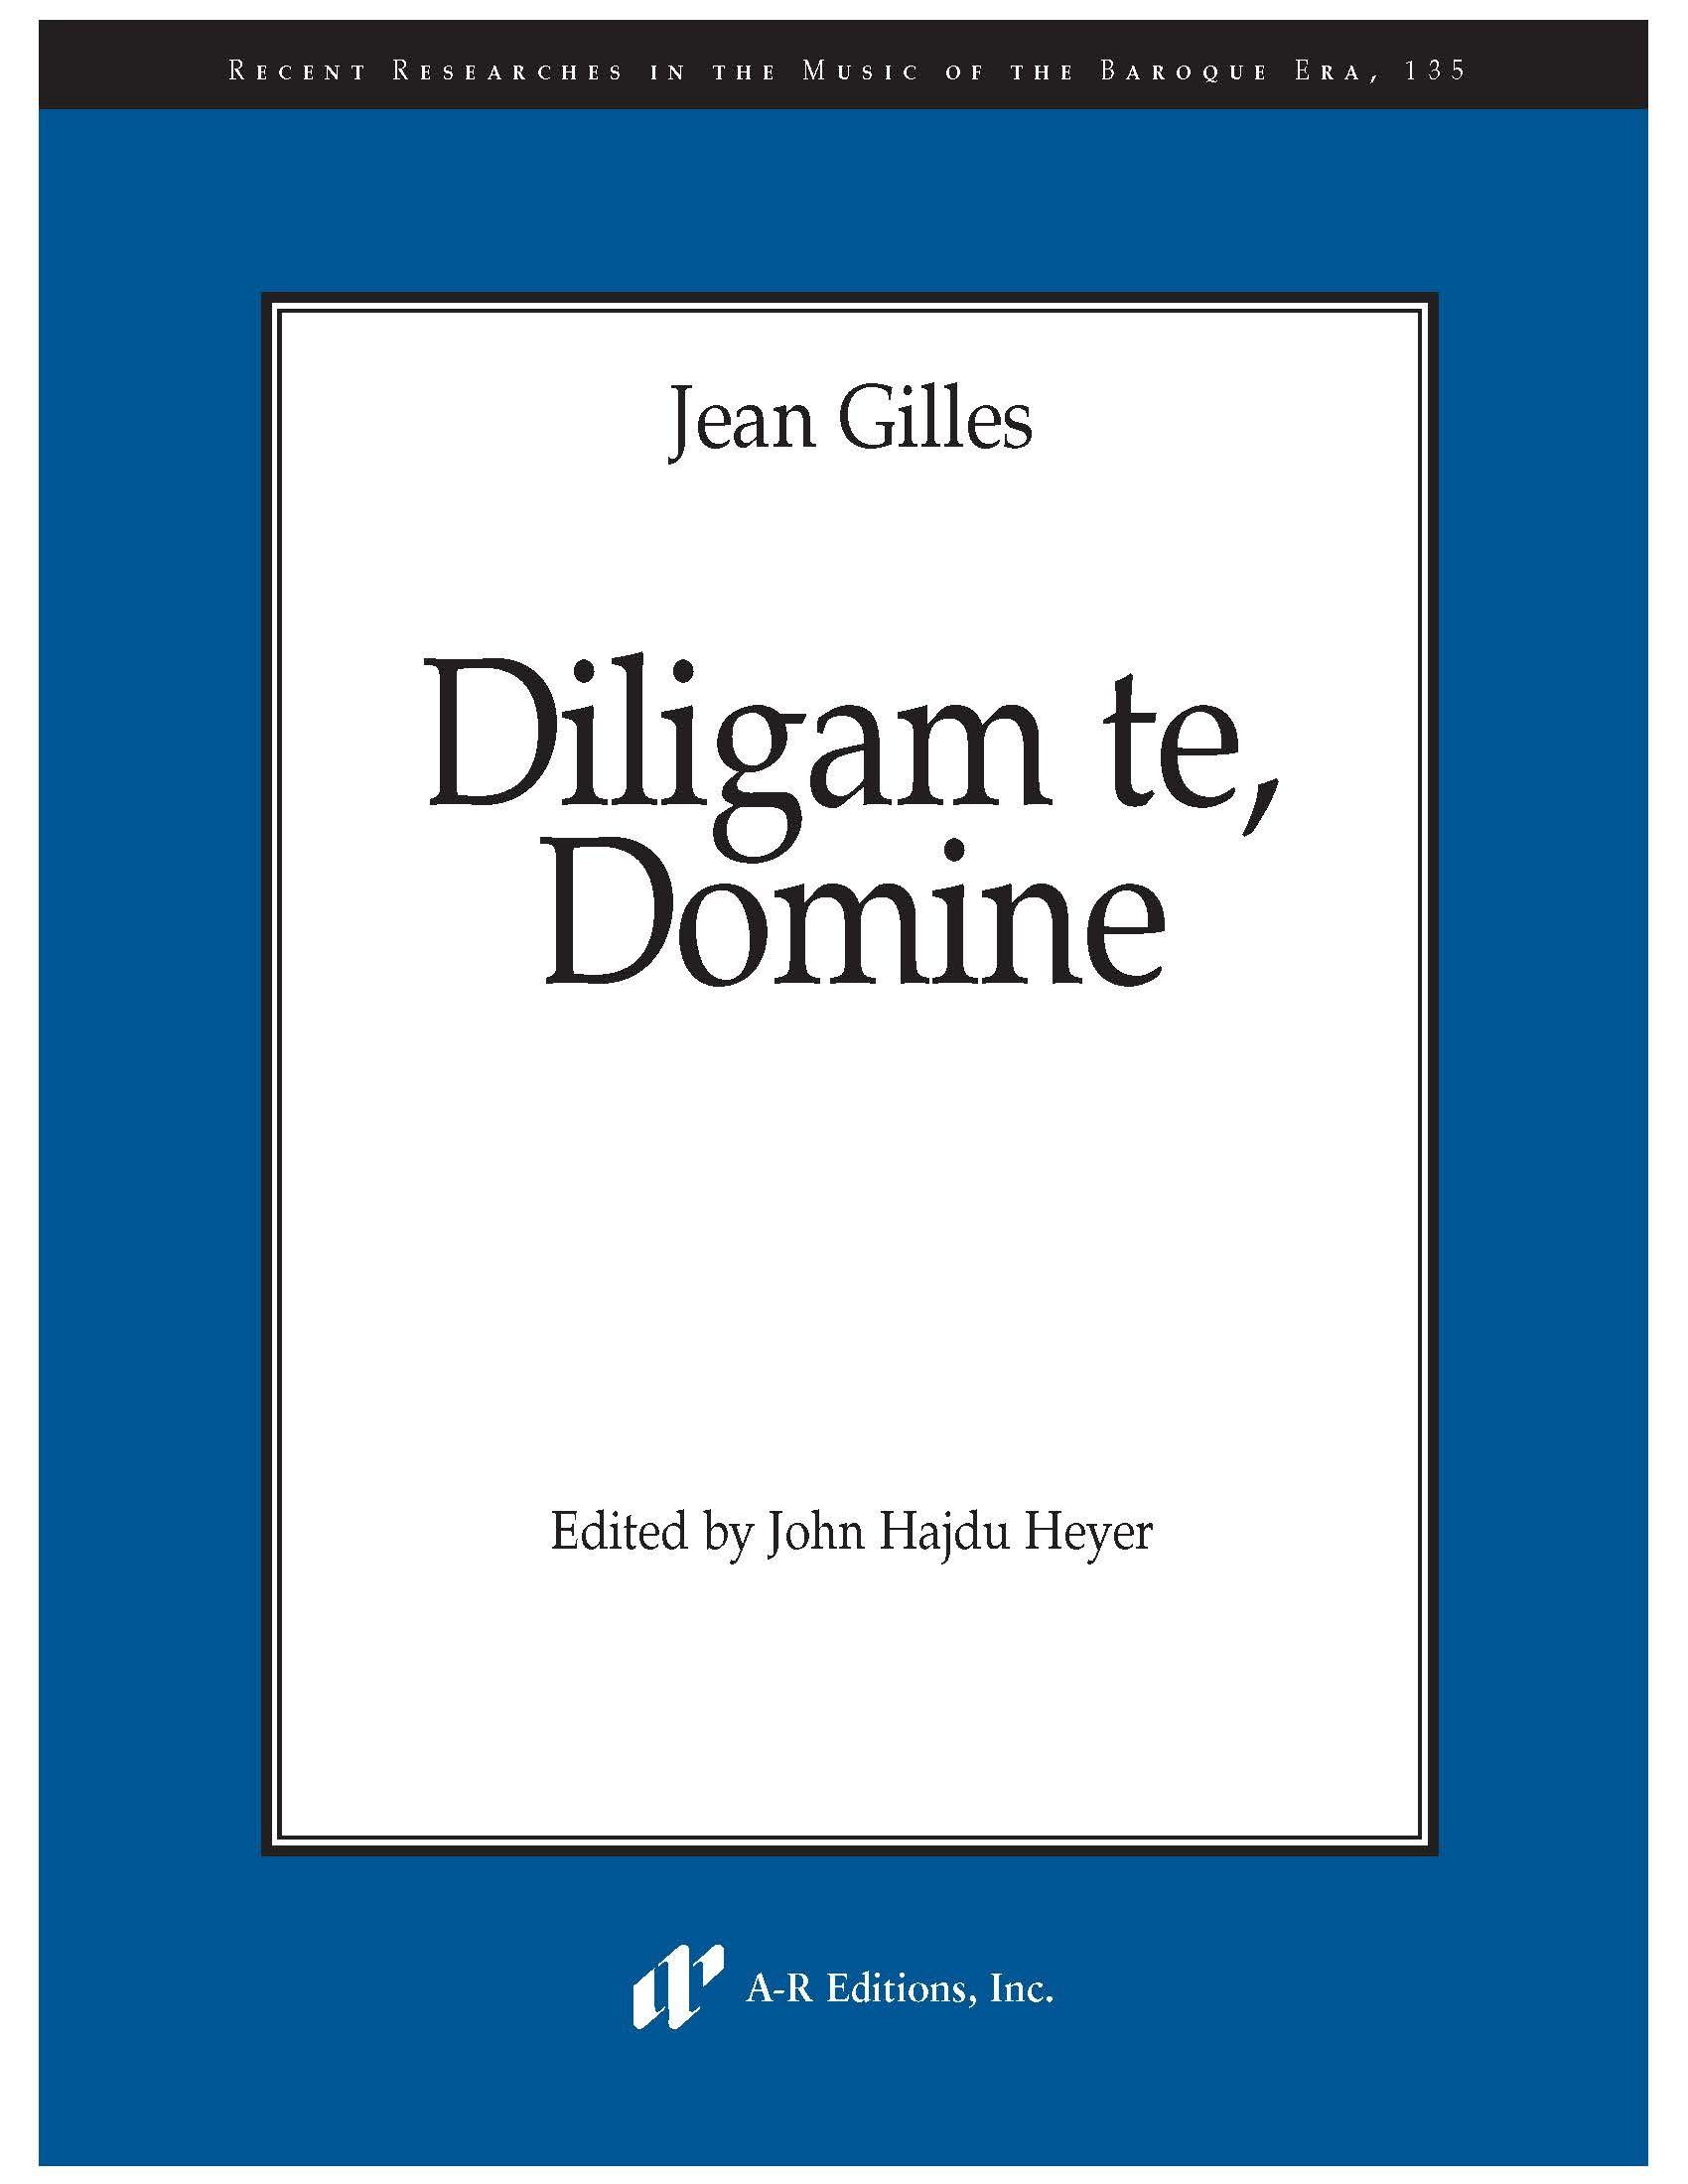 Gilles: Diligam te, Domine